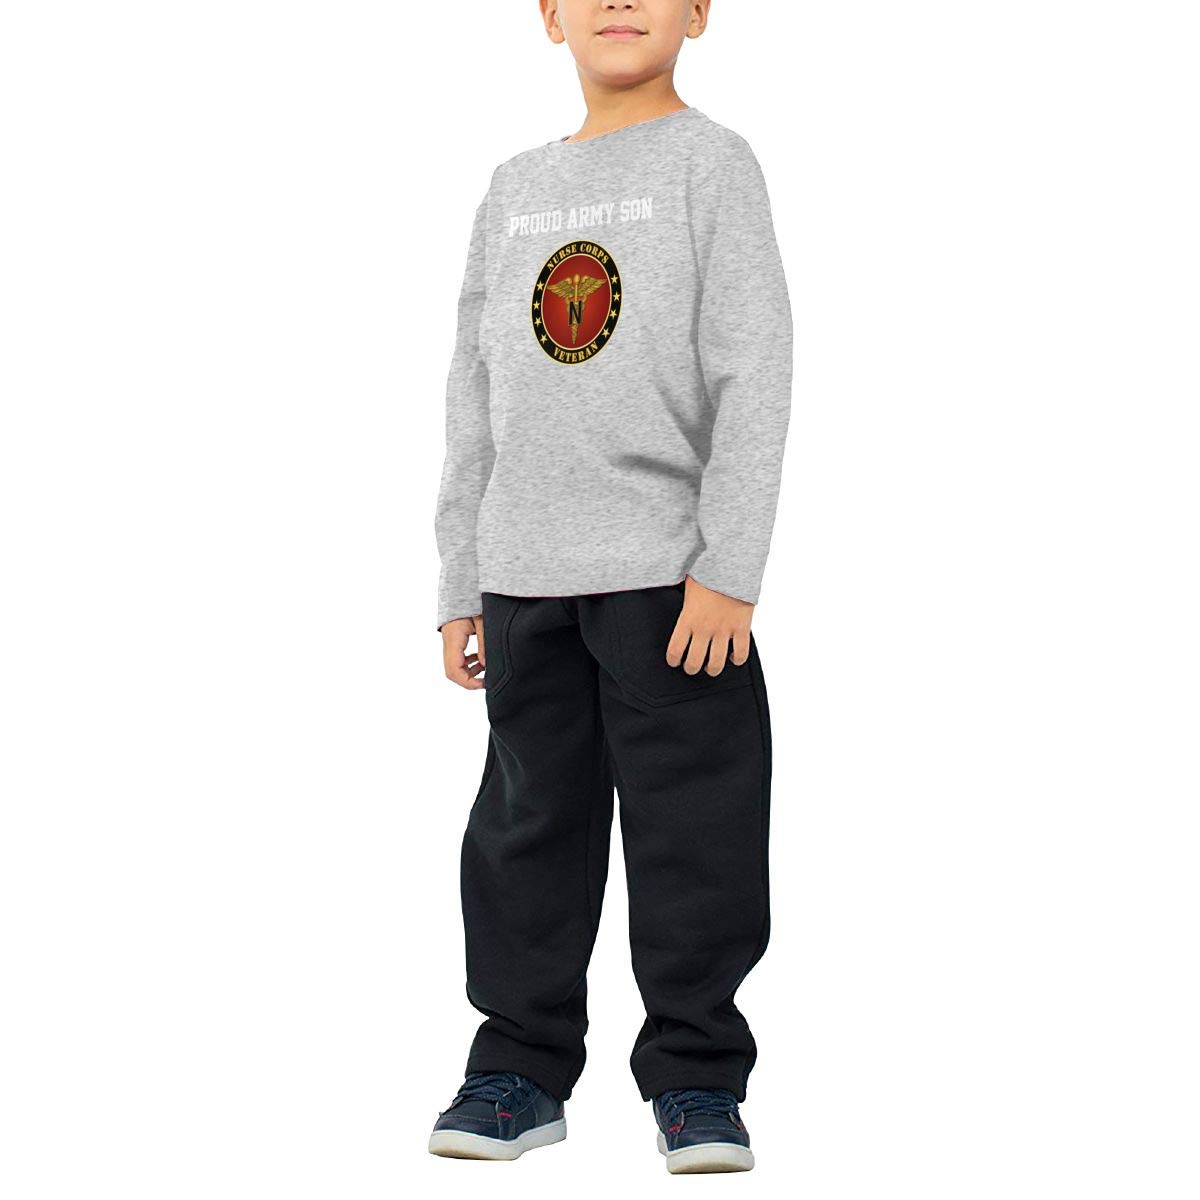 HADYKIDSLOVE Army Nurse Corps Kids T-Shirt Long Sleeve Boys Girls T-Shirt